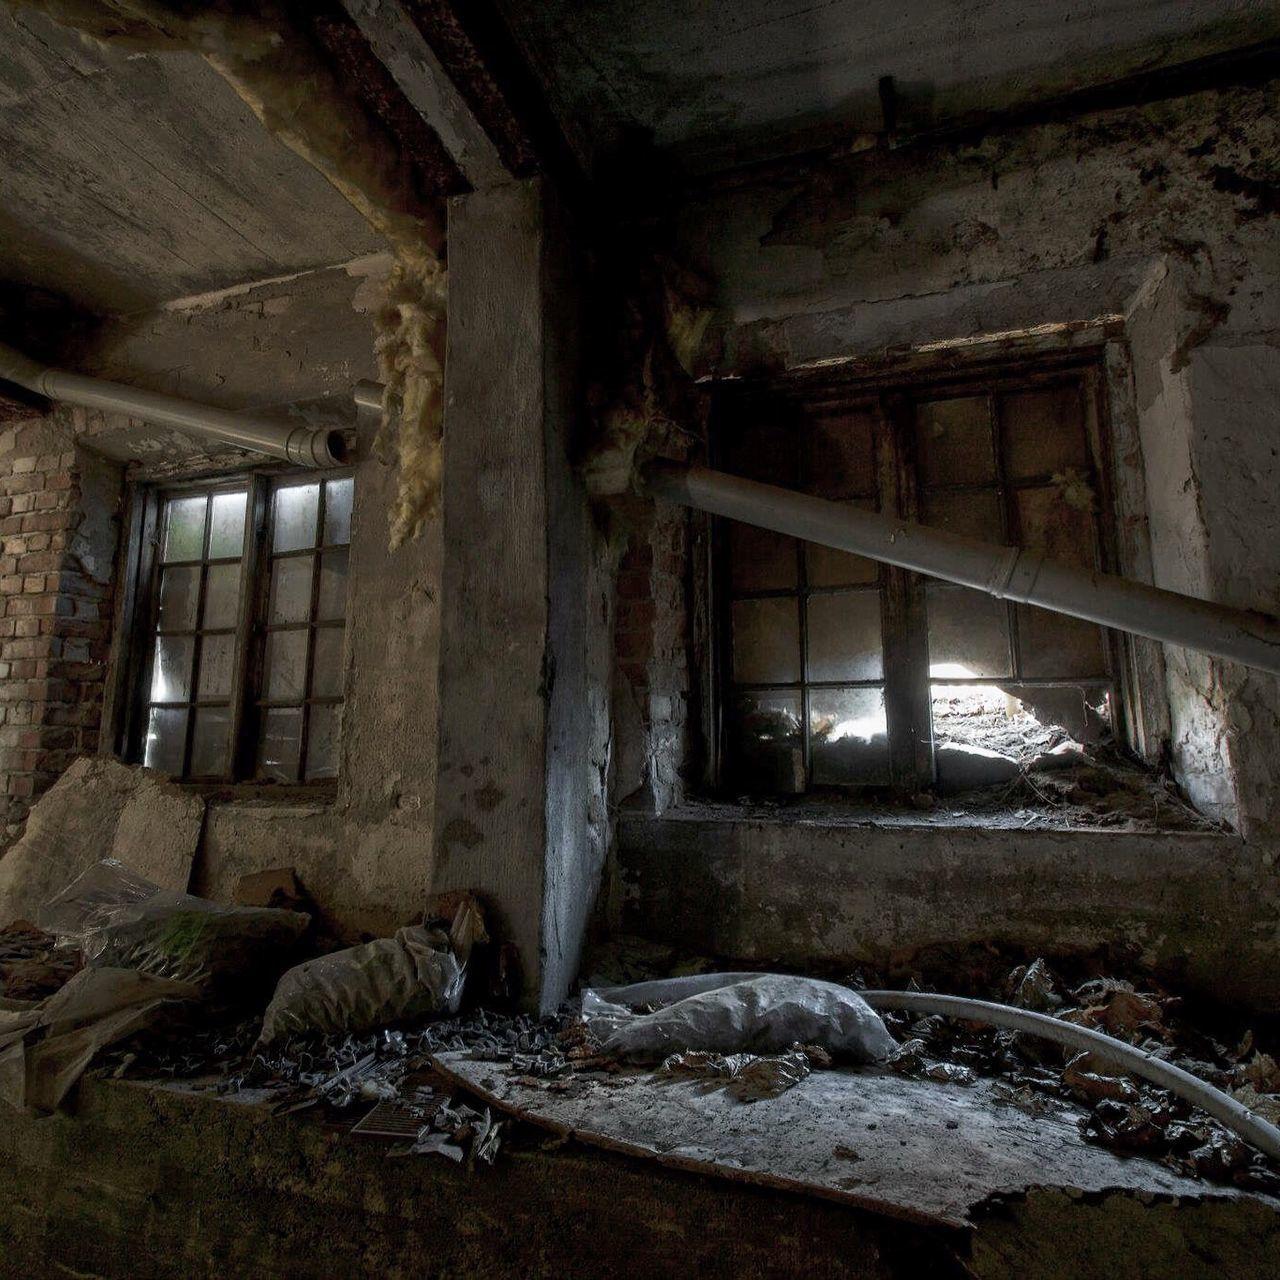 Interior Of Damaged Room